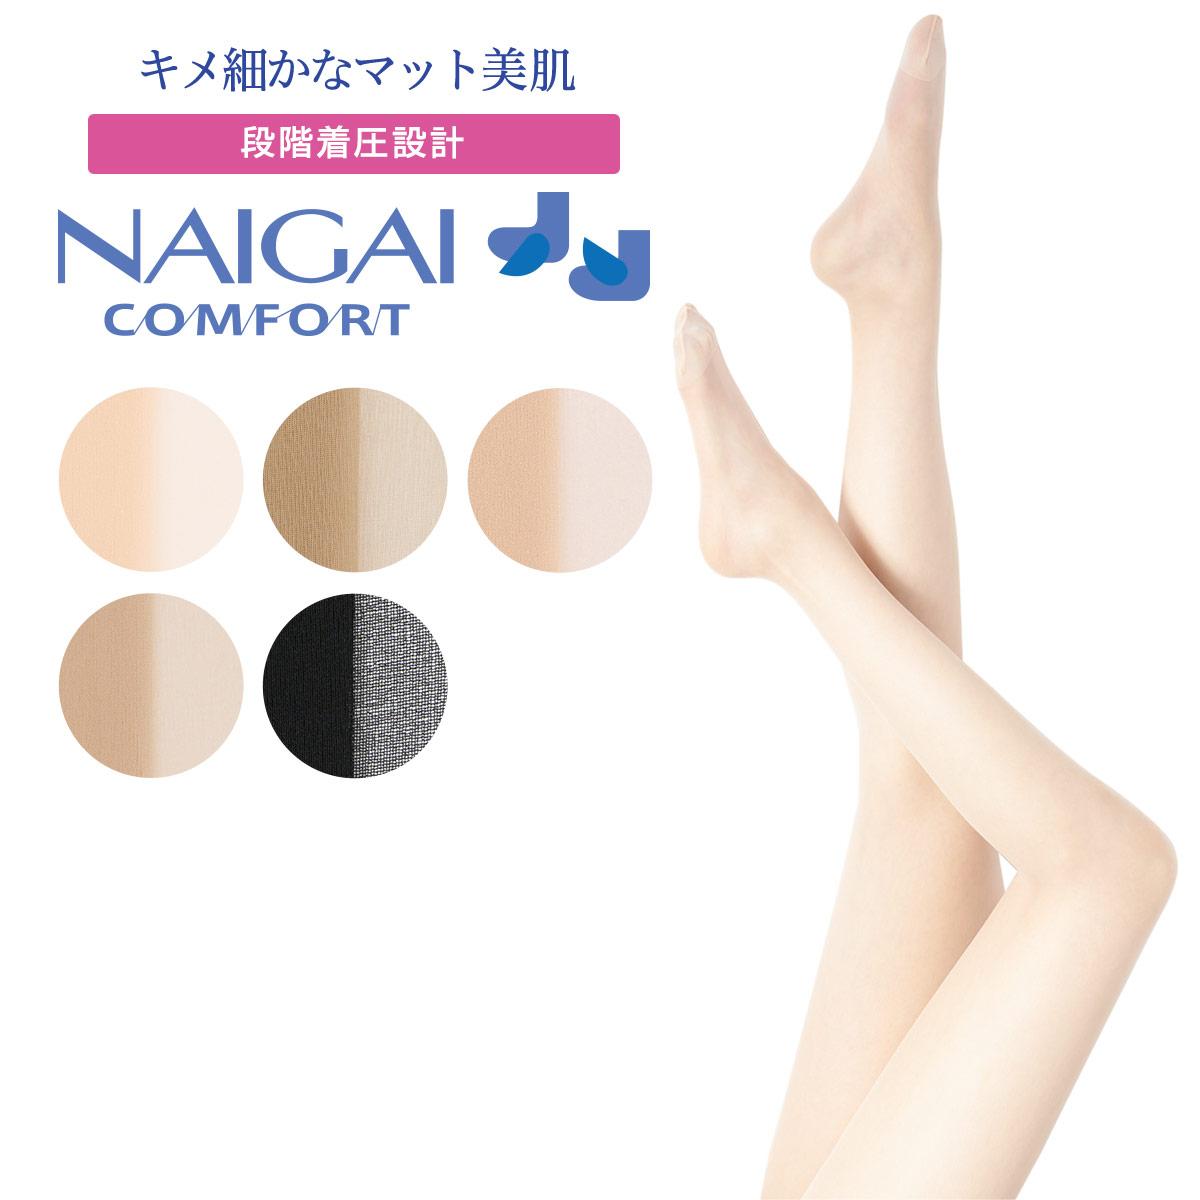 NAIGAI COMFORT 日本製 段階着圧 キメ細かなマット美肌 ゾッキ ウエストゆったりゴム使用 つま先補強 レディース パンティ ストッキング